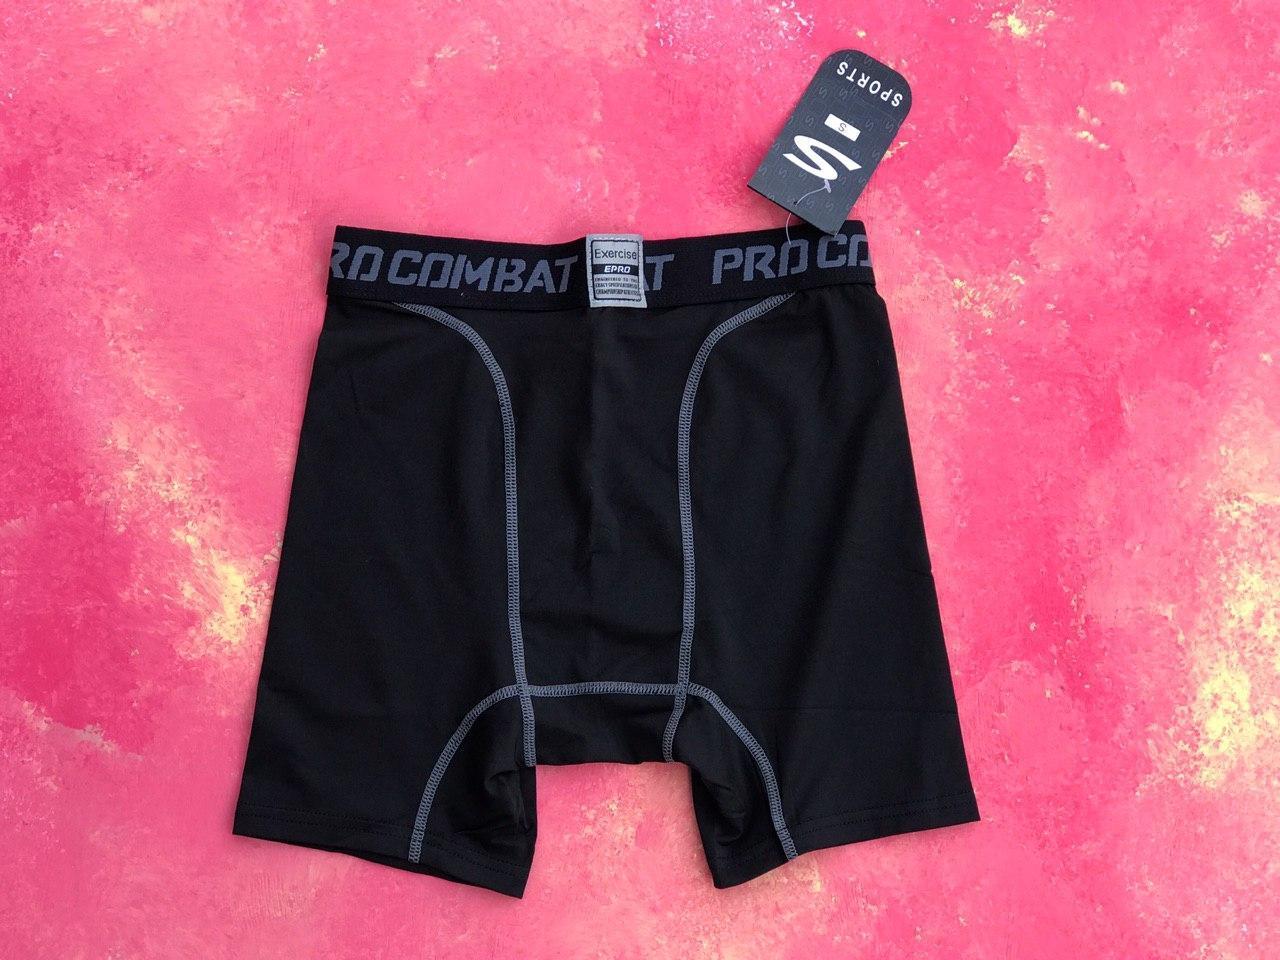 Термо-шорты Nike Pro 2019/компрессионные шорты/термобелье/лосины